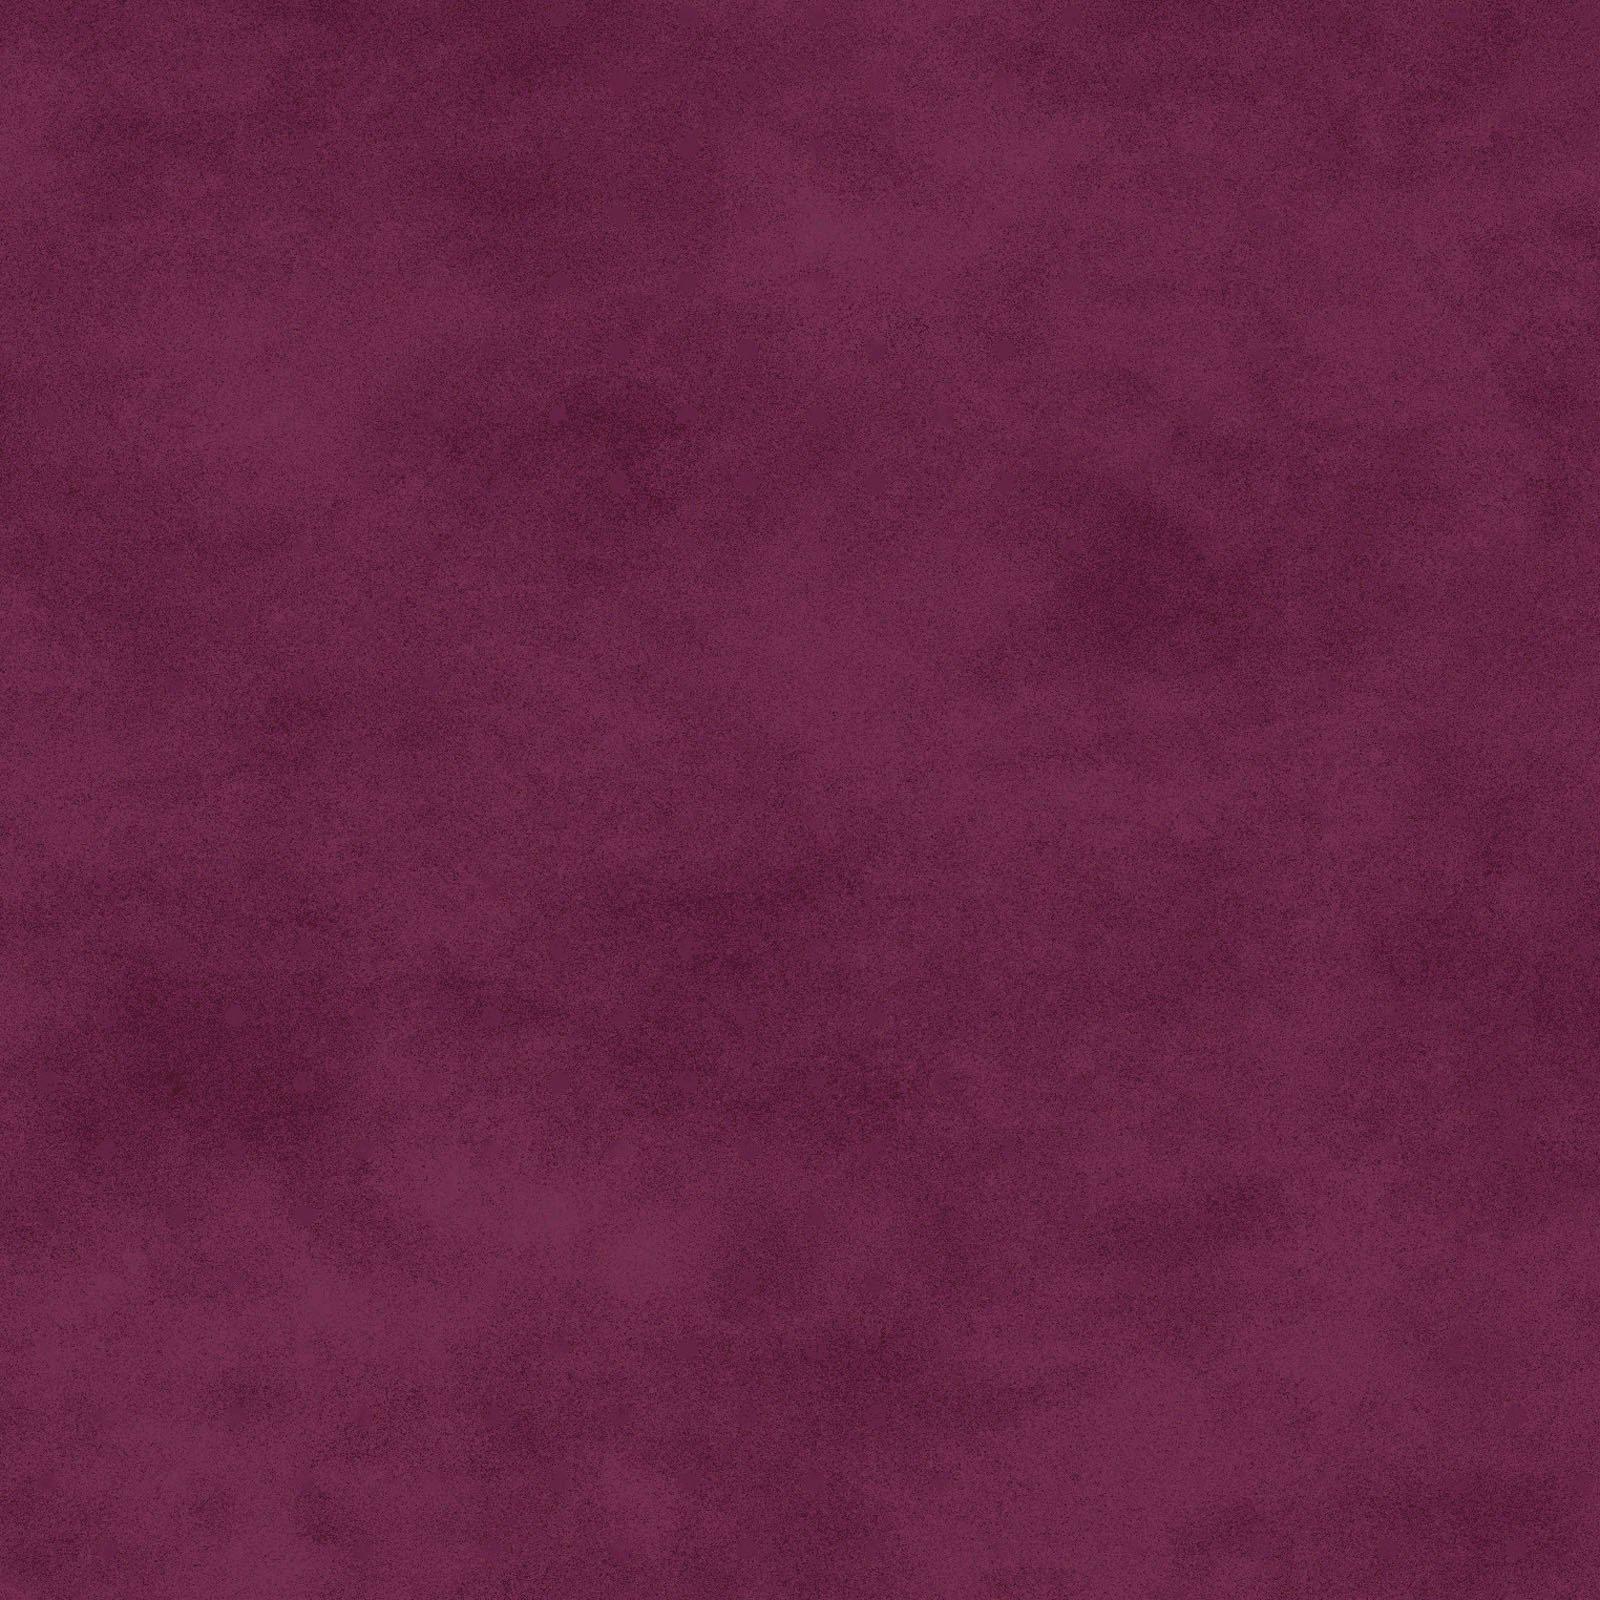 Victorian Rose - Shadow Play - MAS513-V22